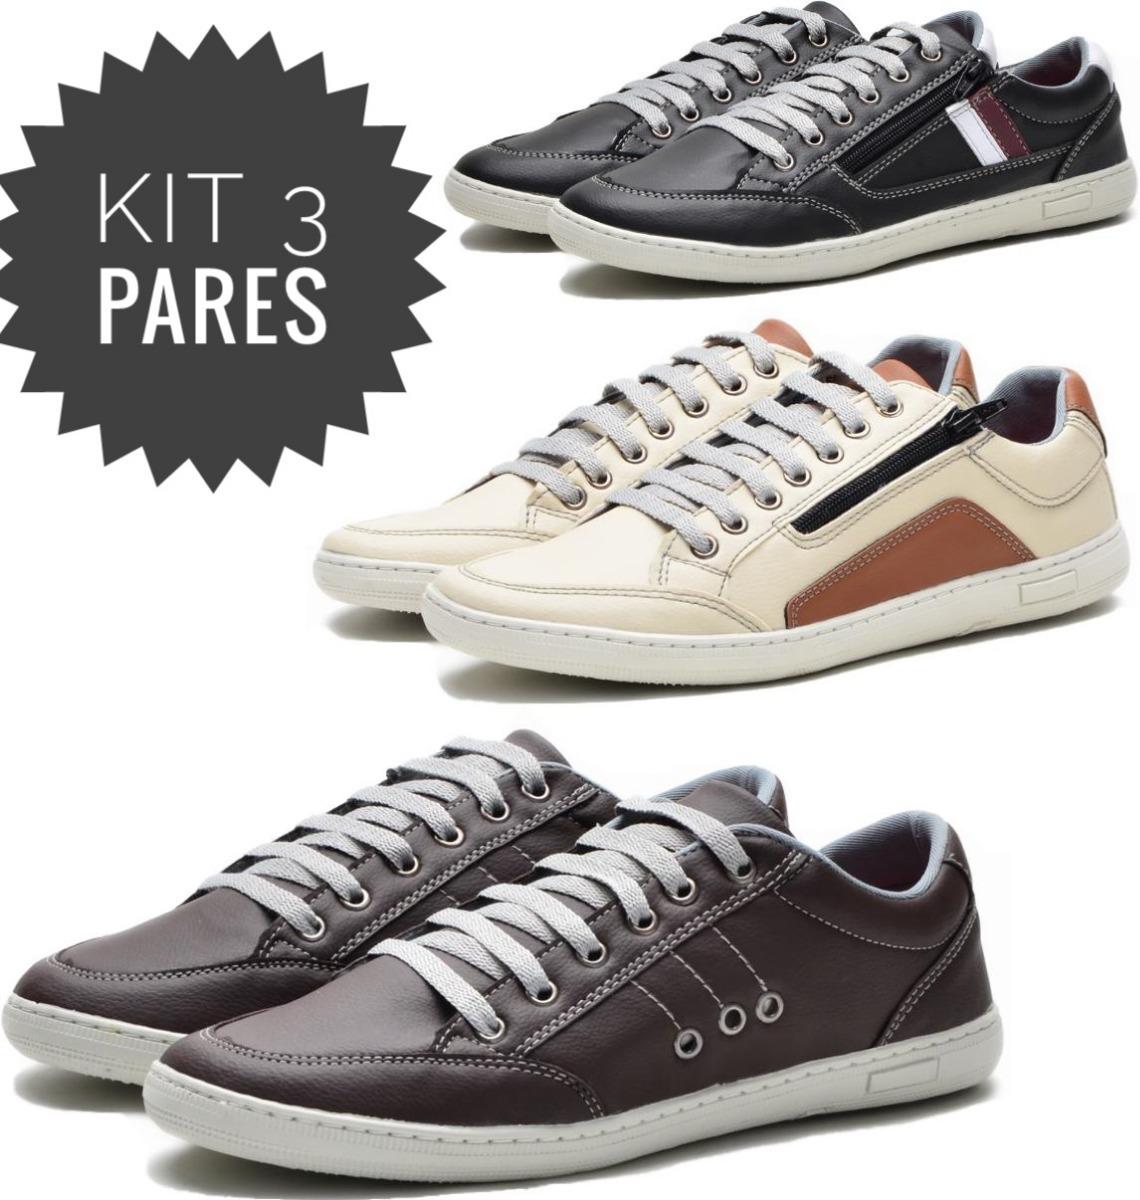 2060194377 kit 3 pares sapatenis masculino tenis casual sapato dockside. Carregando  zoom.